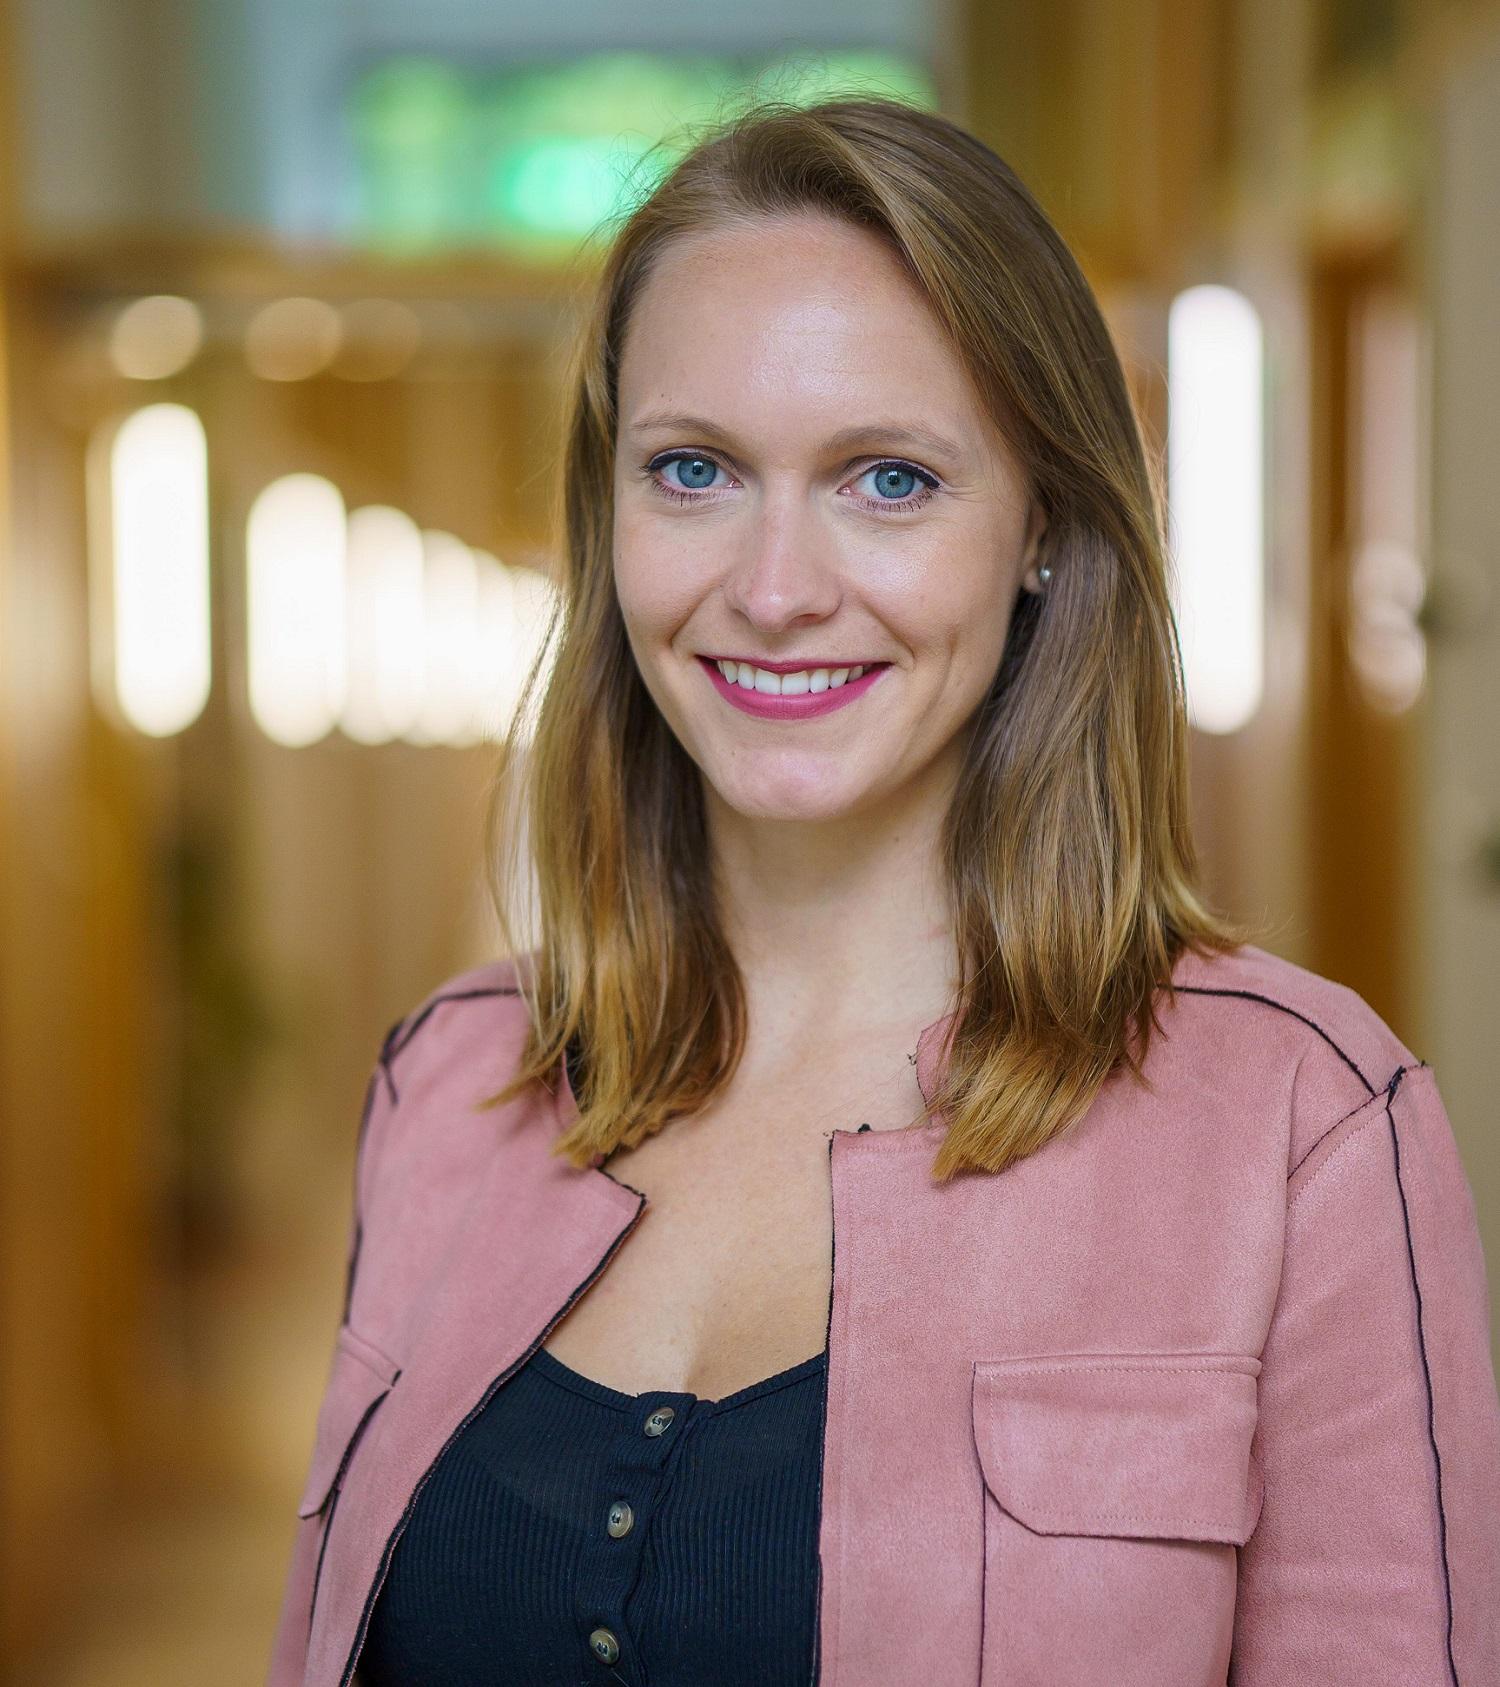 Victoria Jagalski